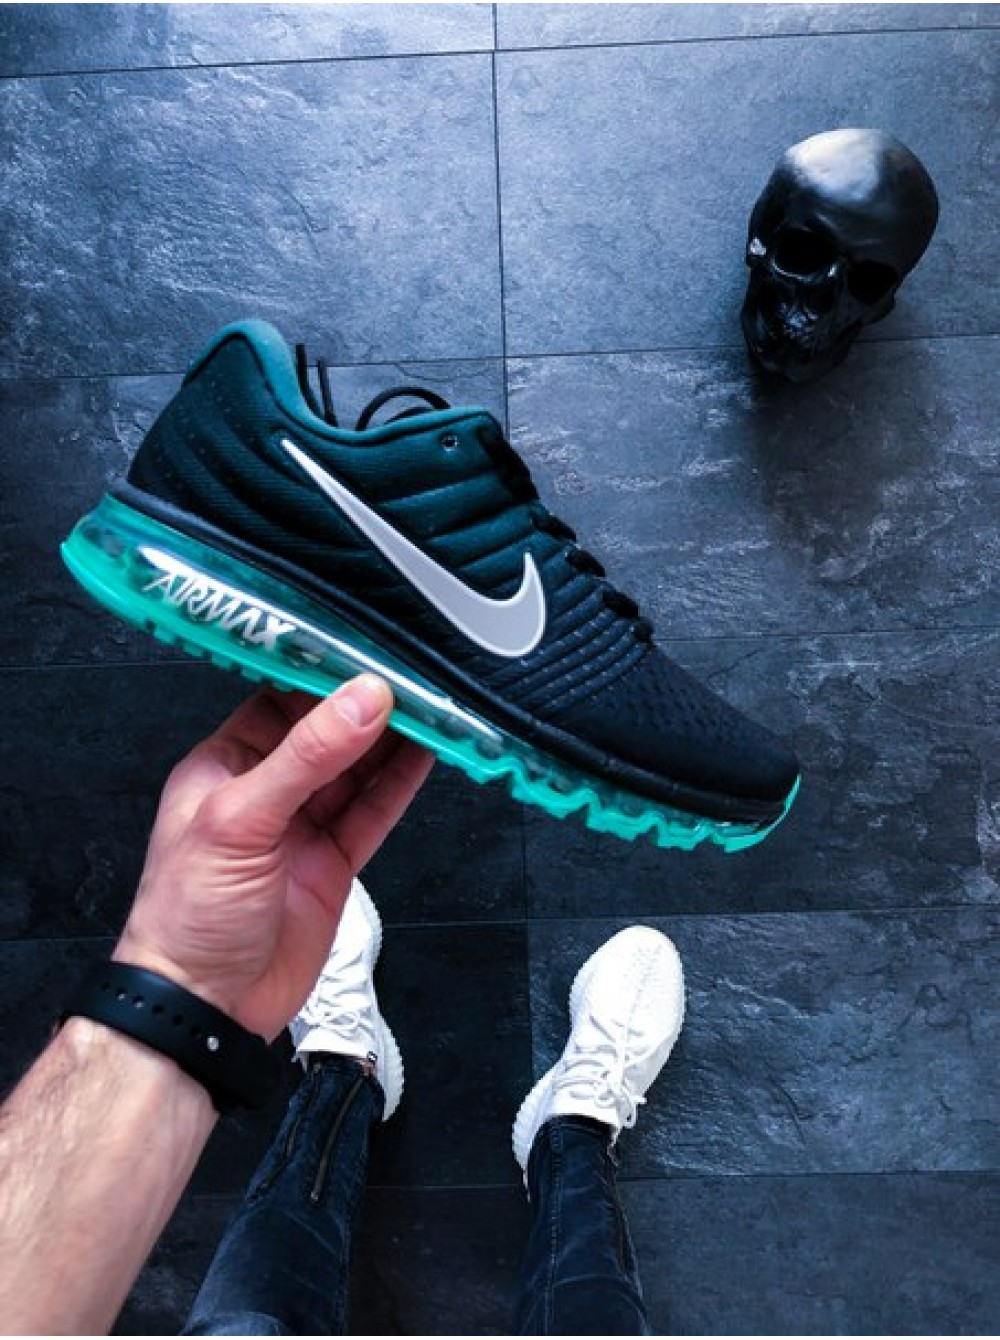 573cca20 Кроссовки Nike Air Max 2017 (Black/White - Green Stone - White)